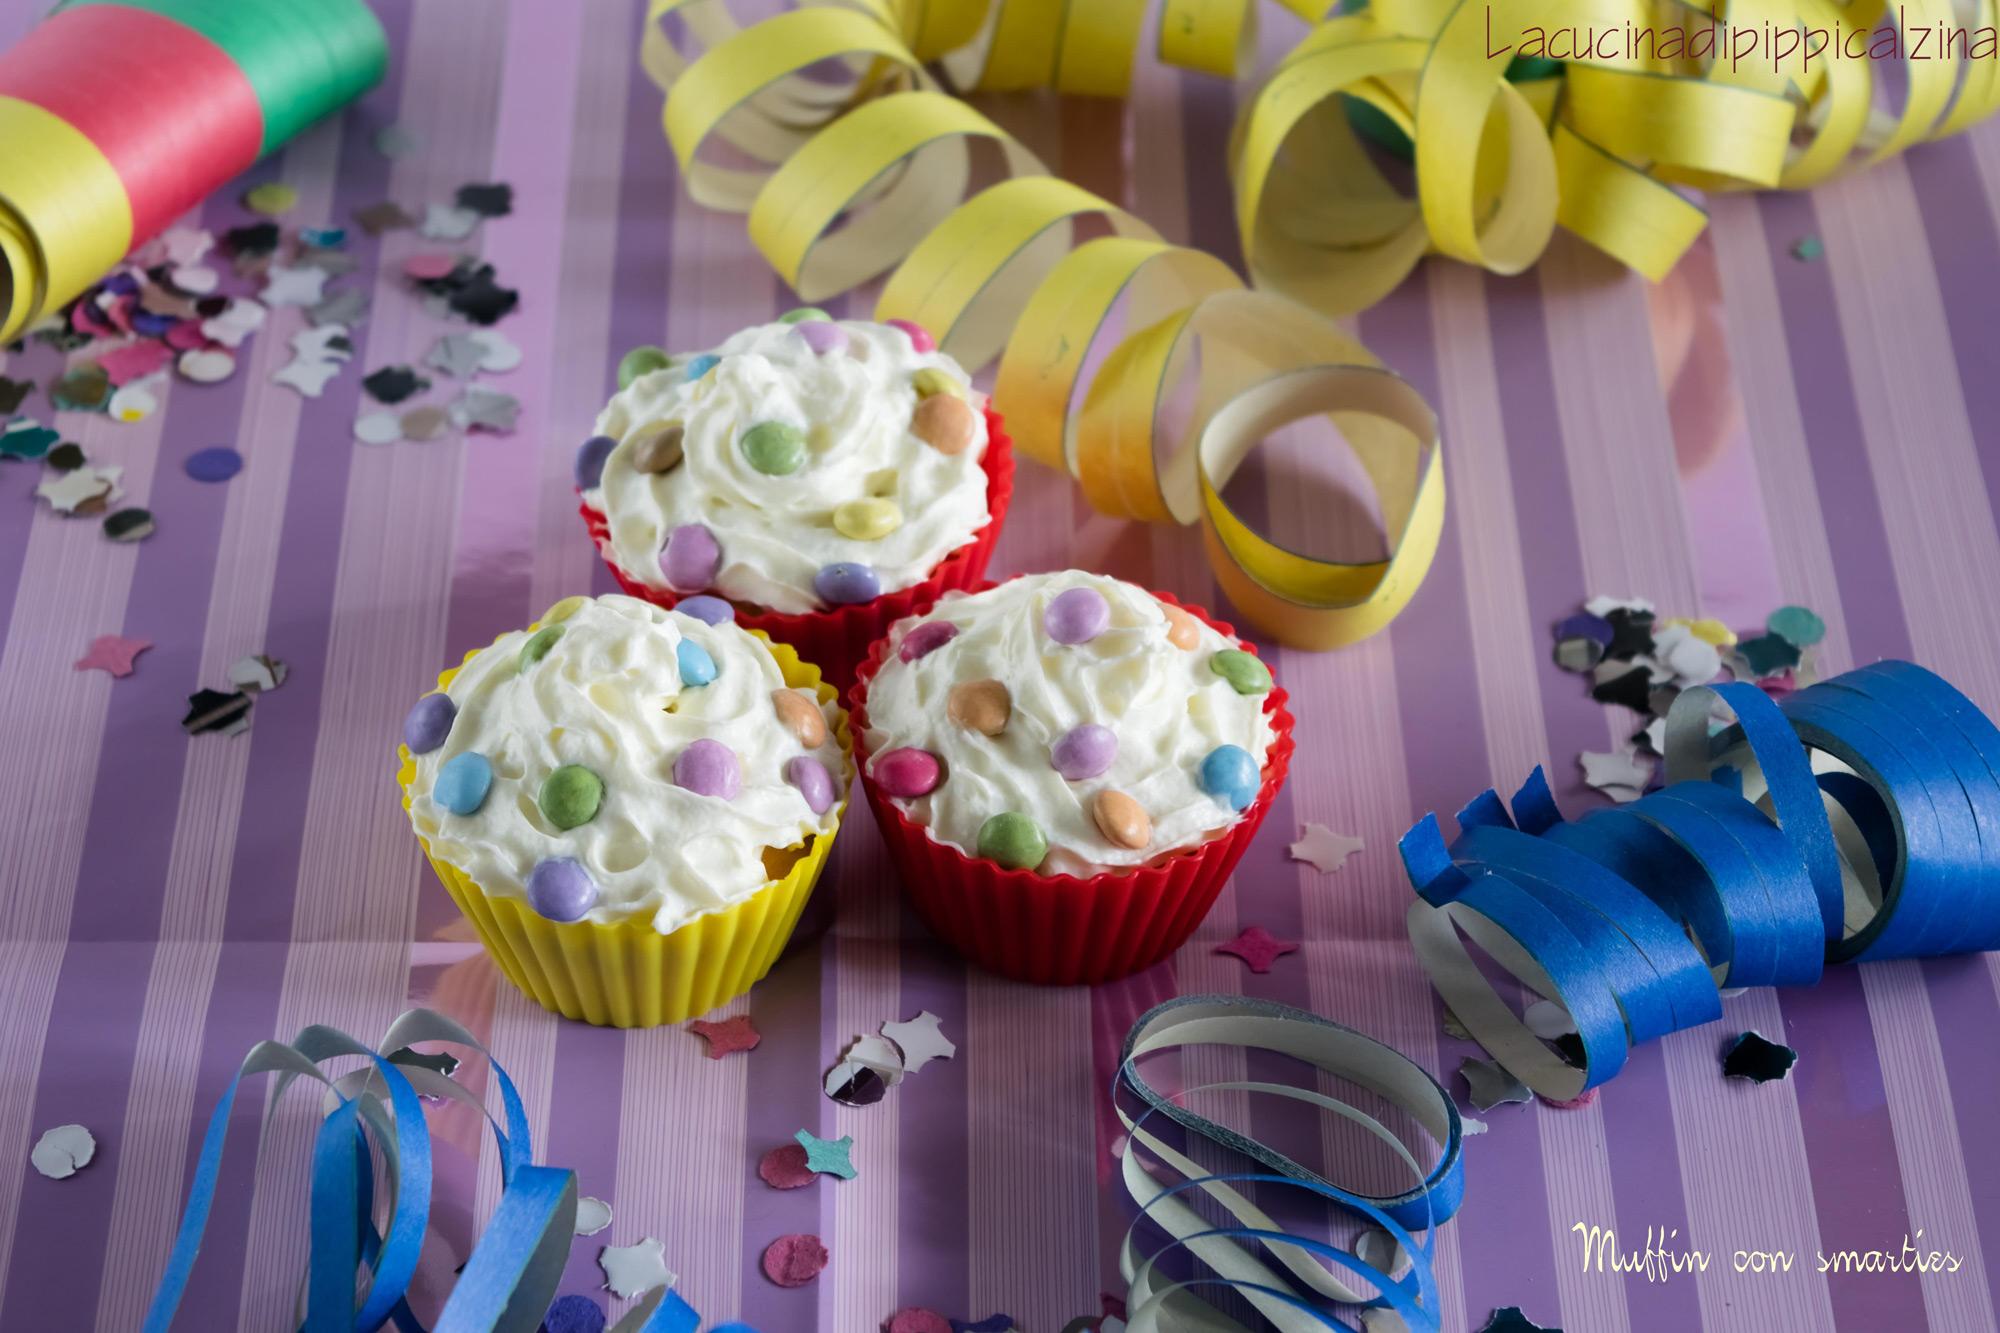 Muffin-smarties